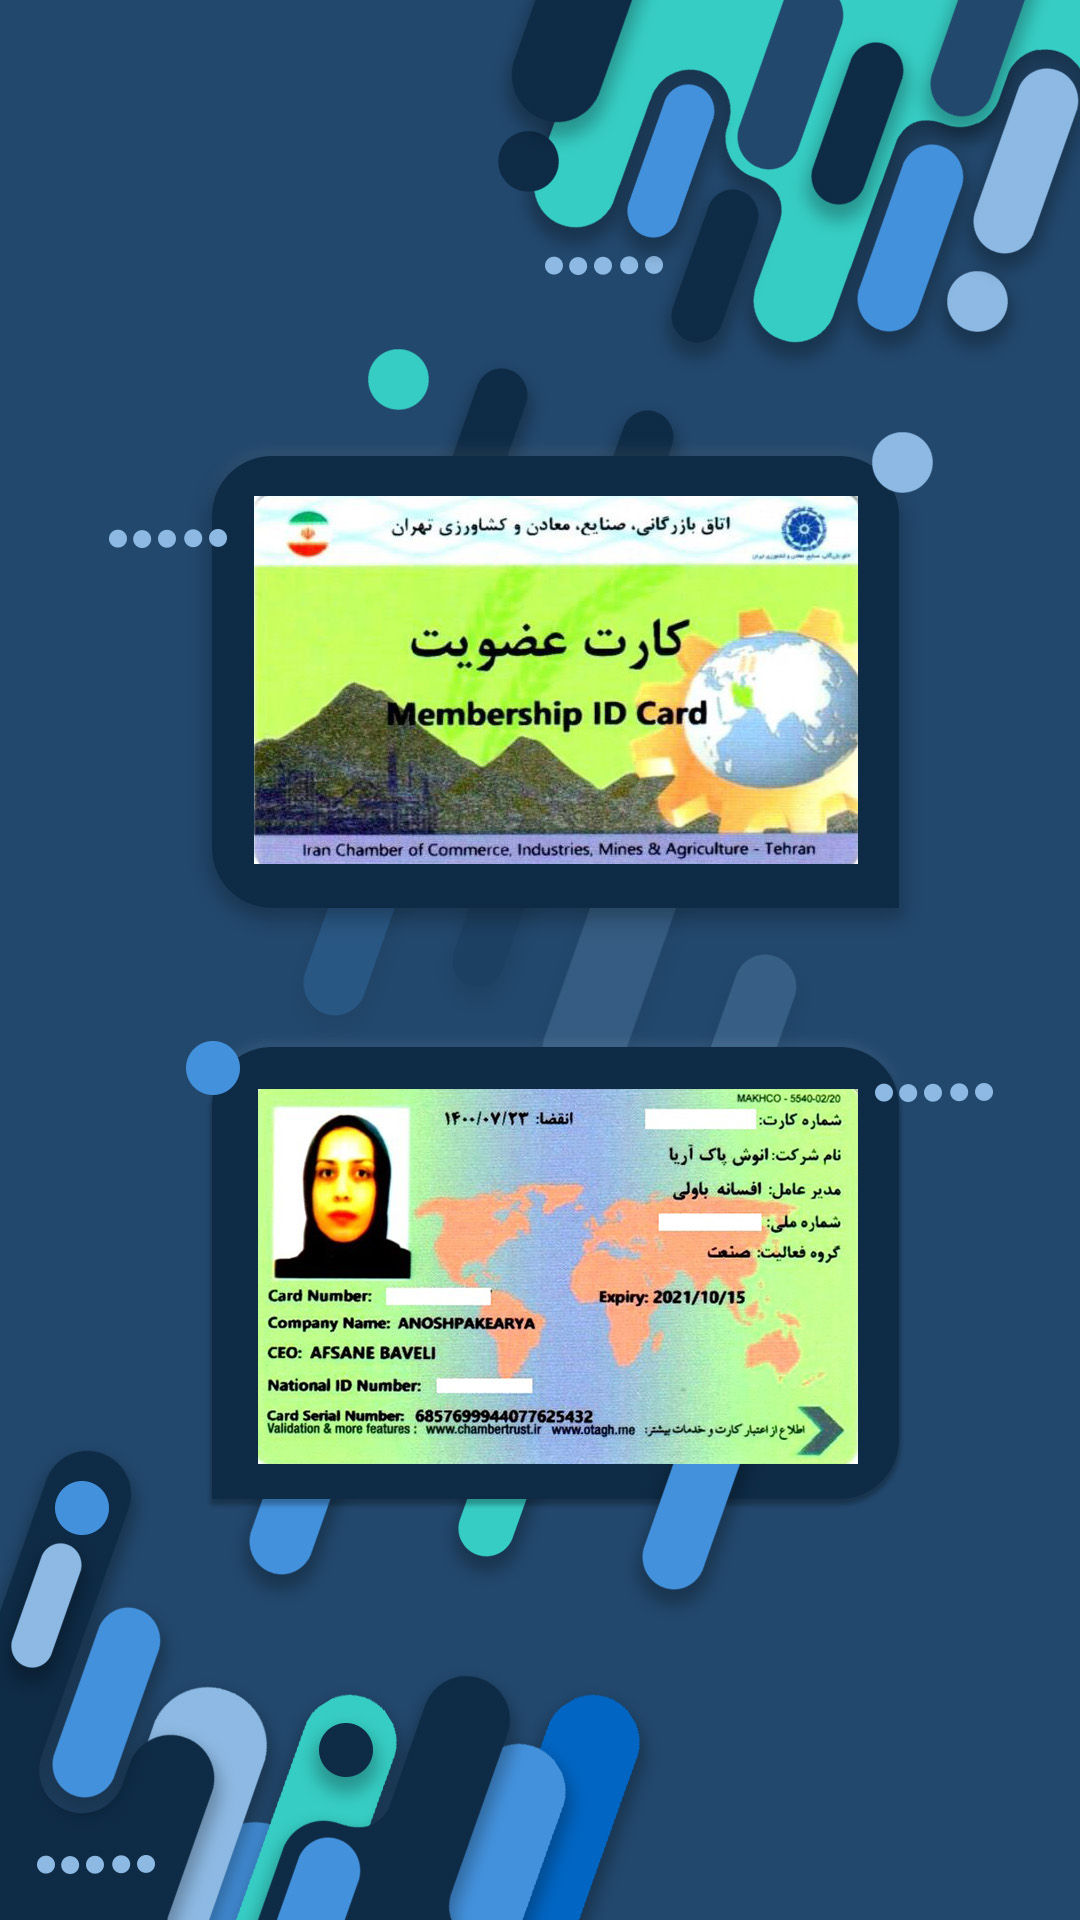 mahan-card-joind-.6-3999